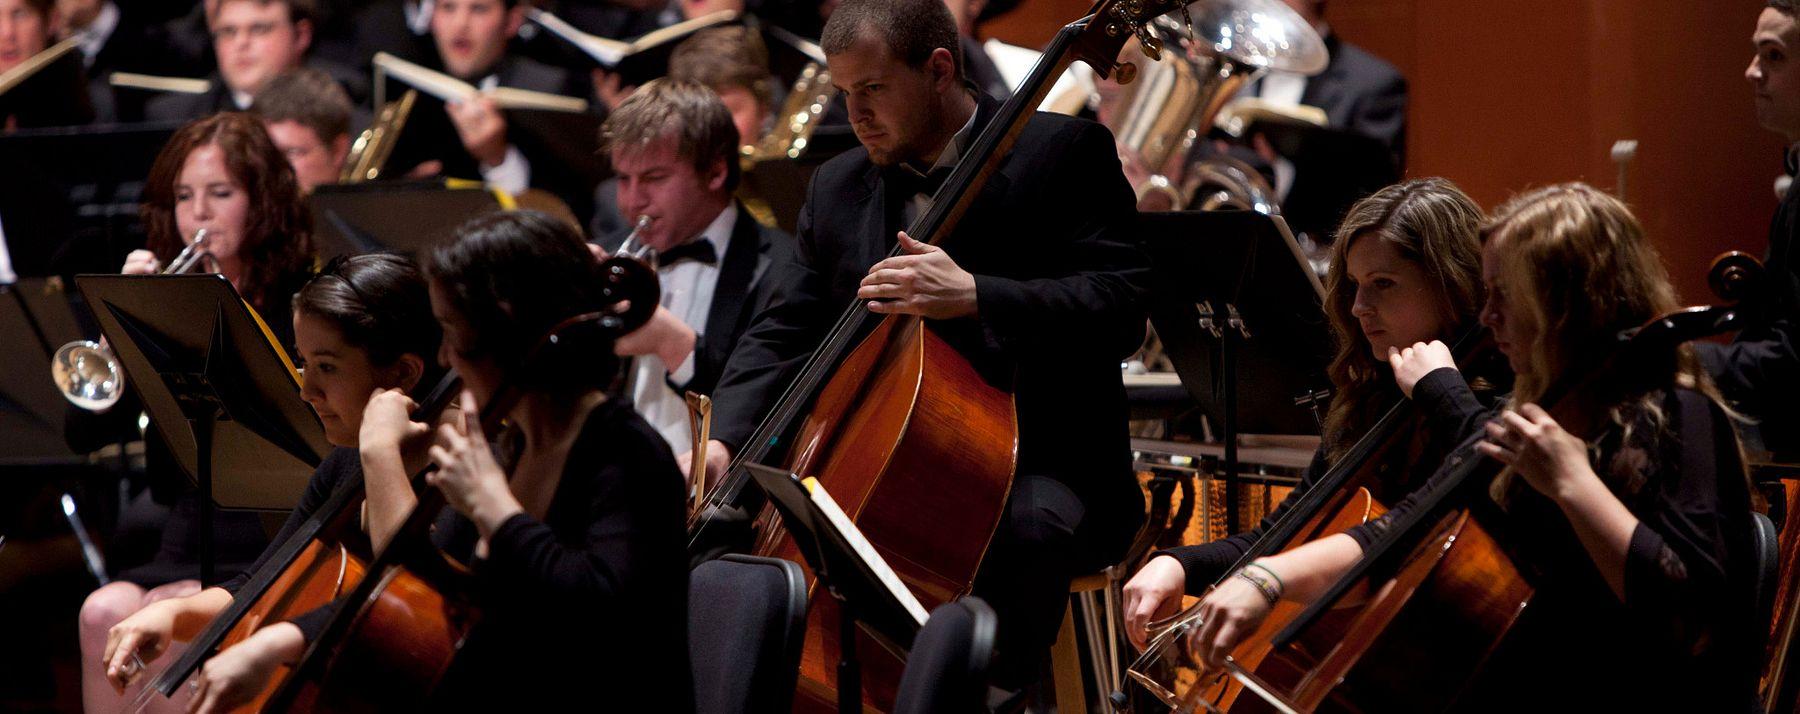 Lamont symphony in performance